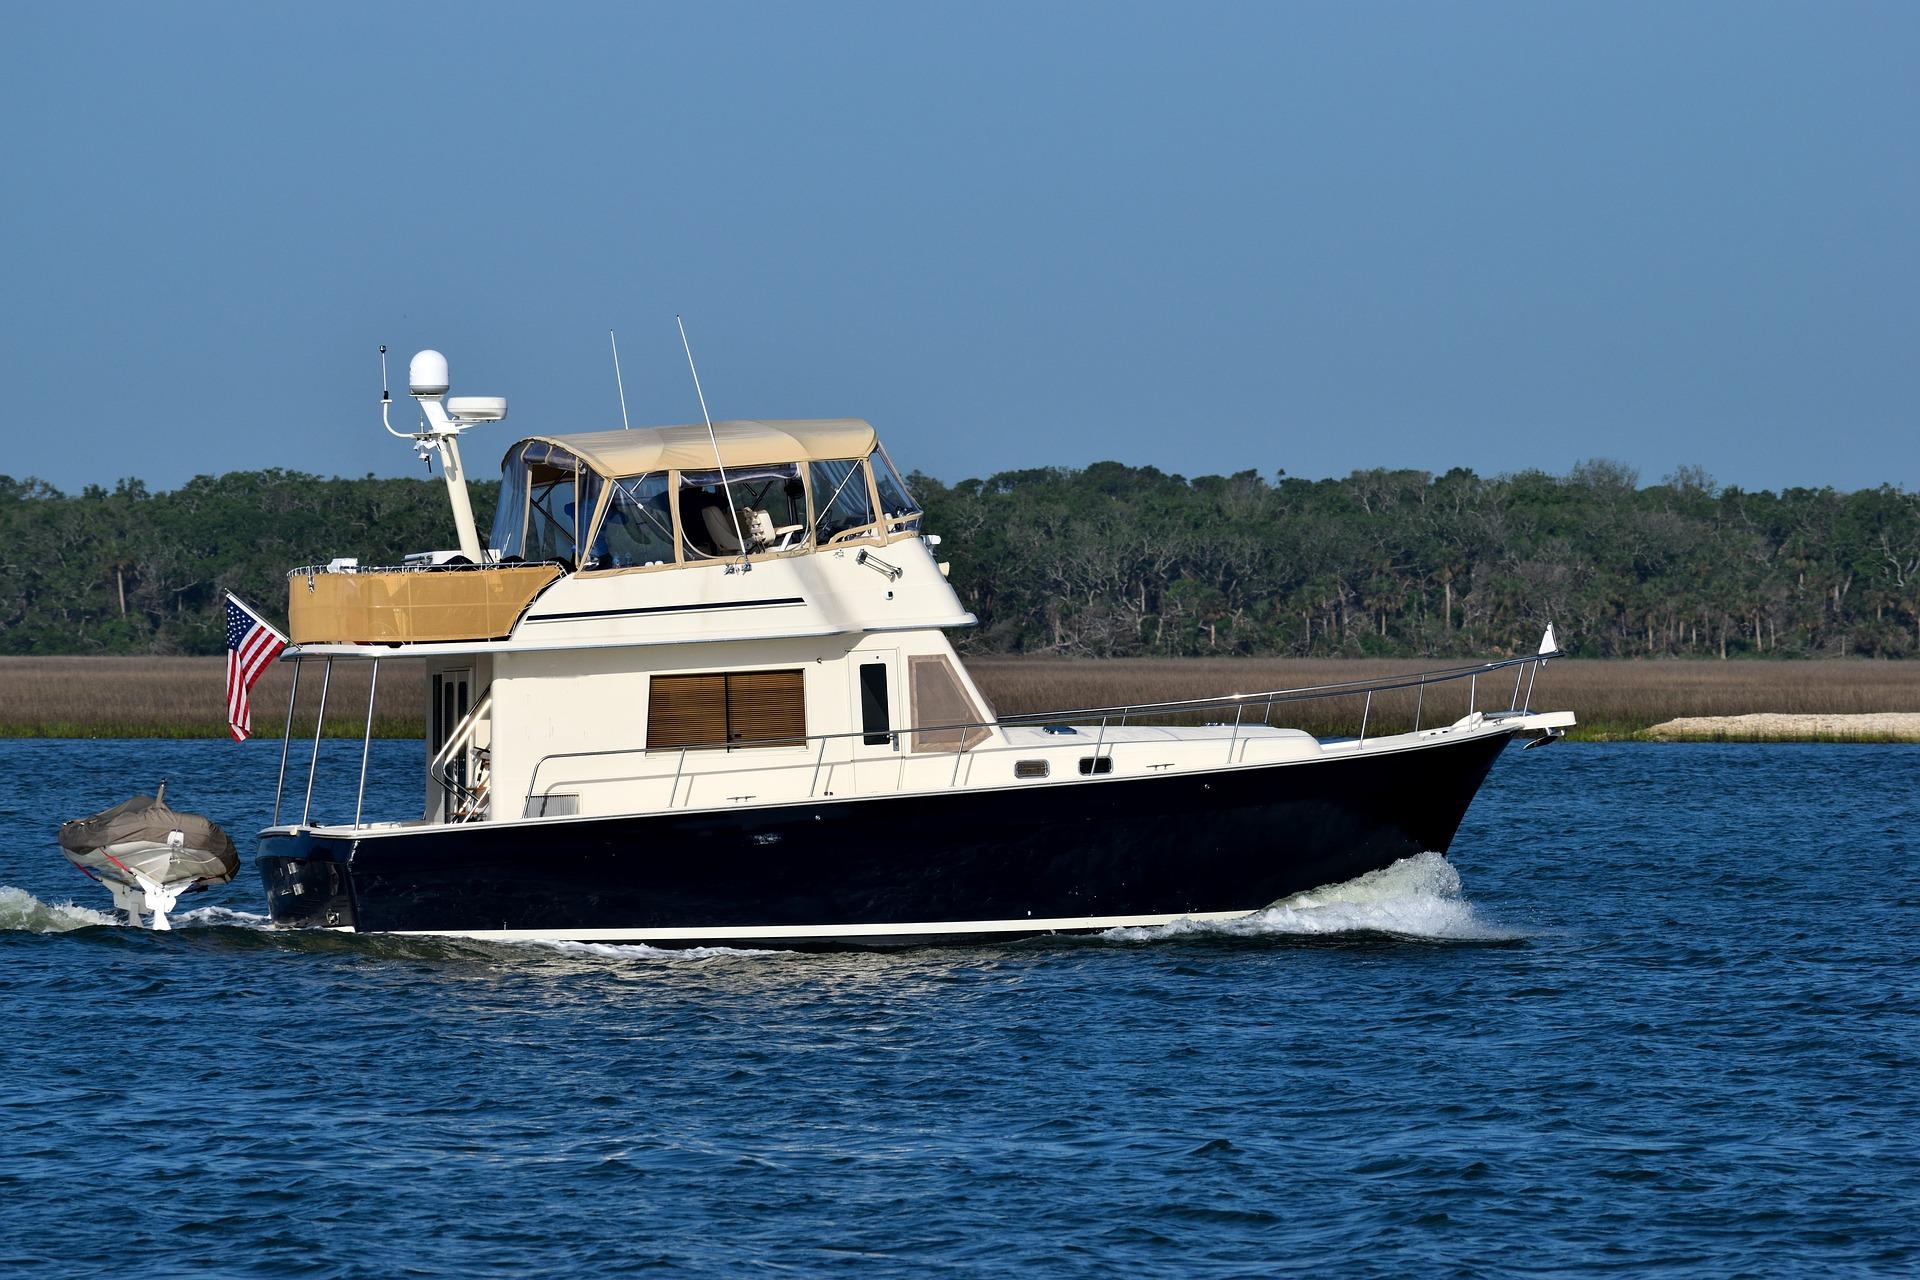 seguro de responsabilidad civil para barcos